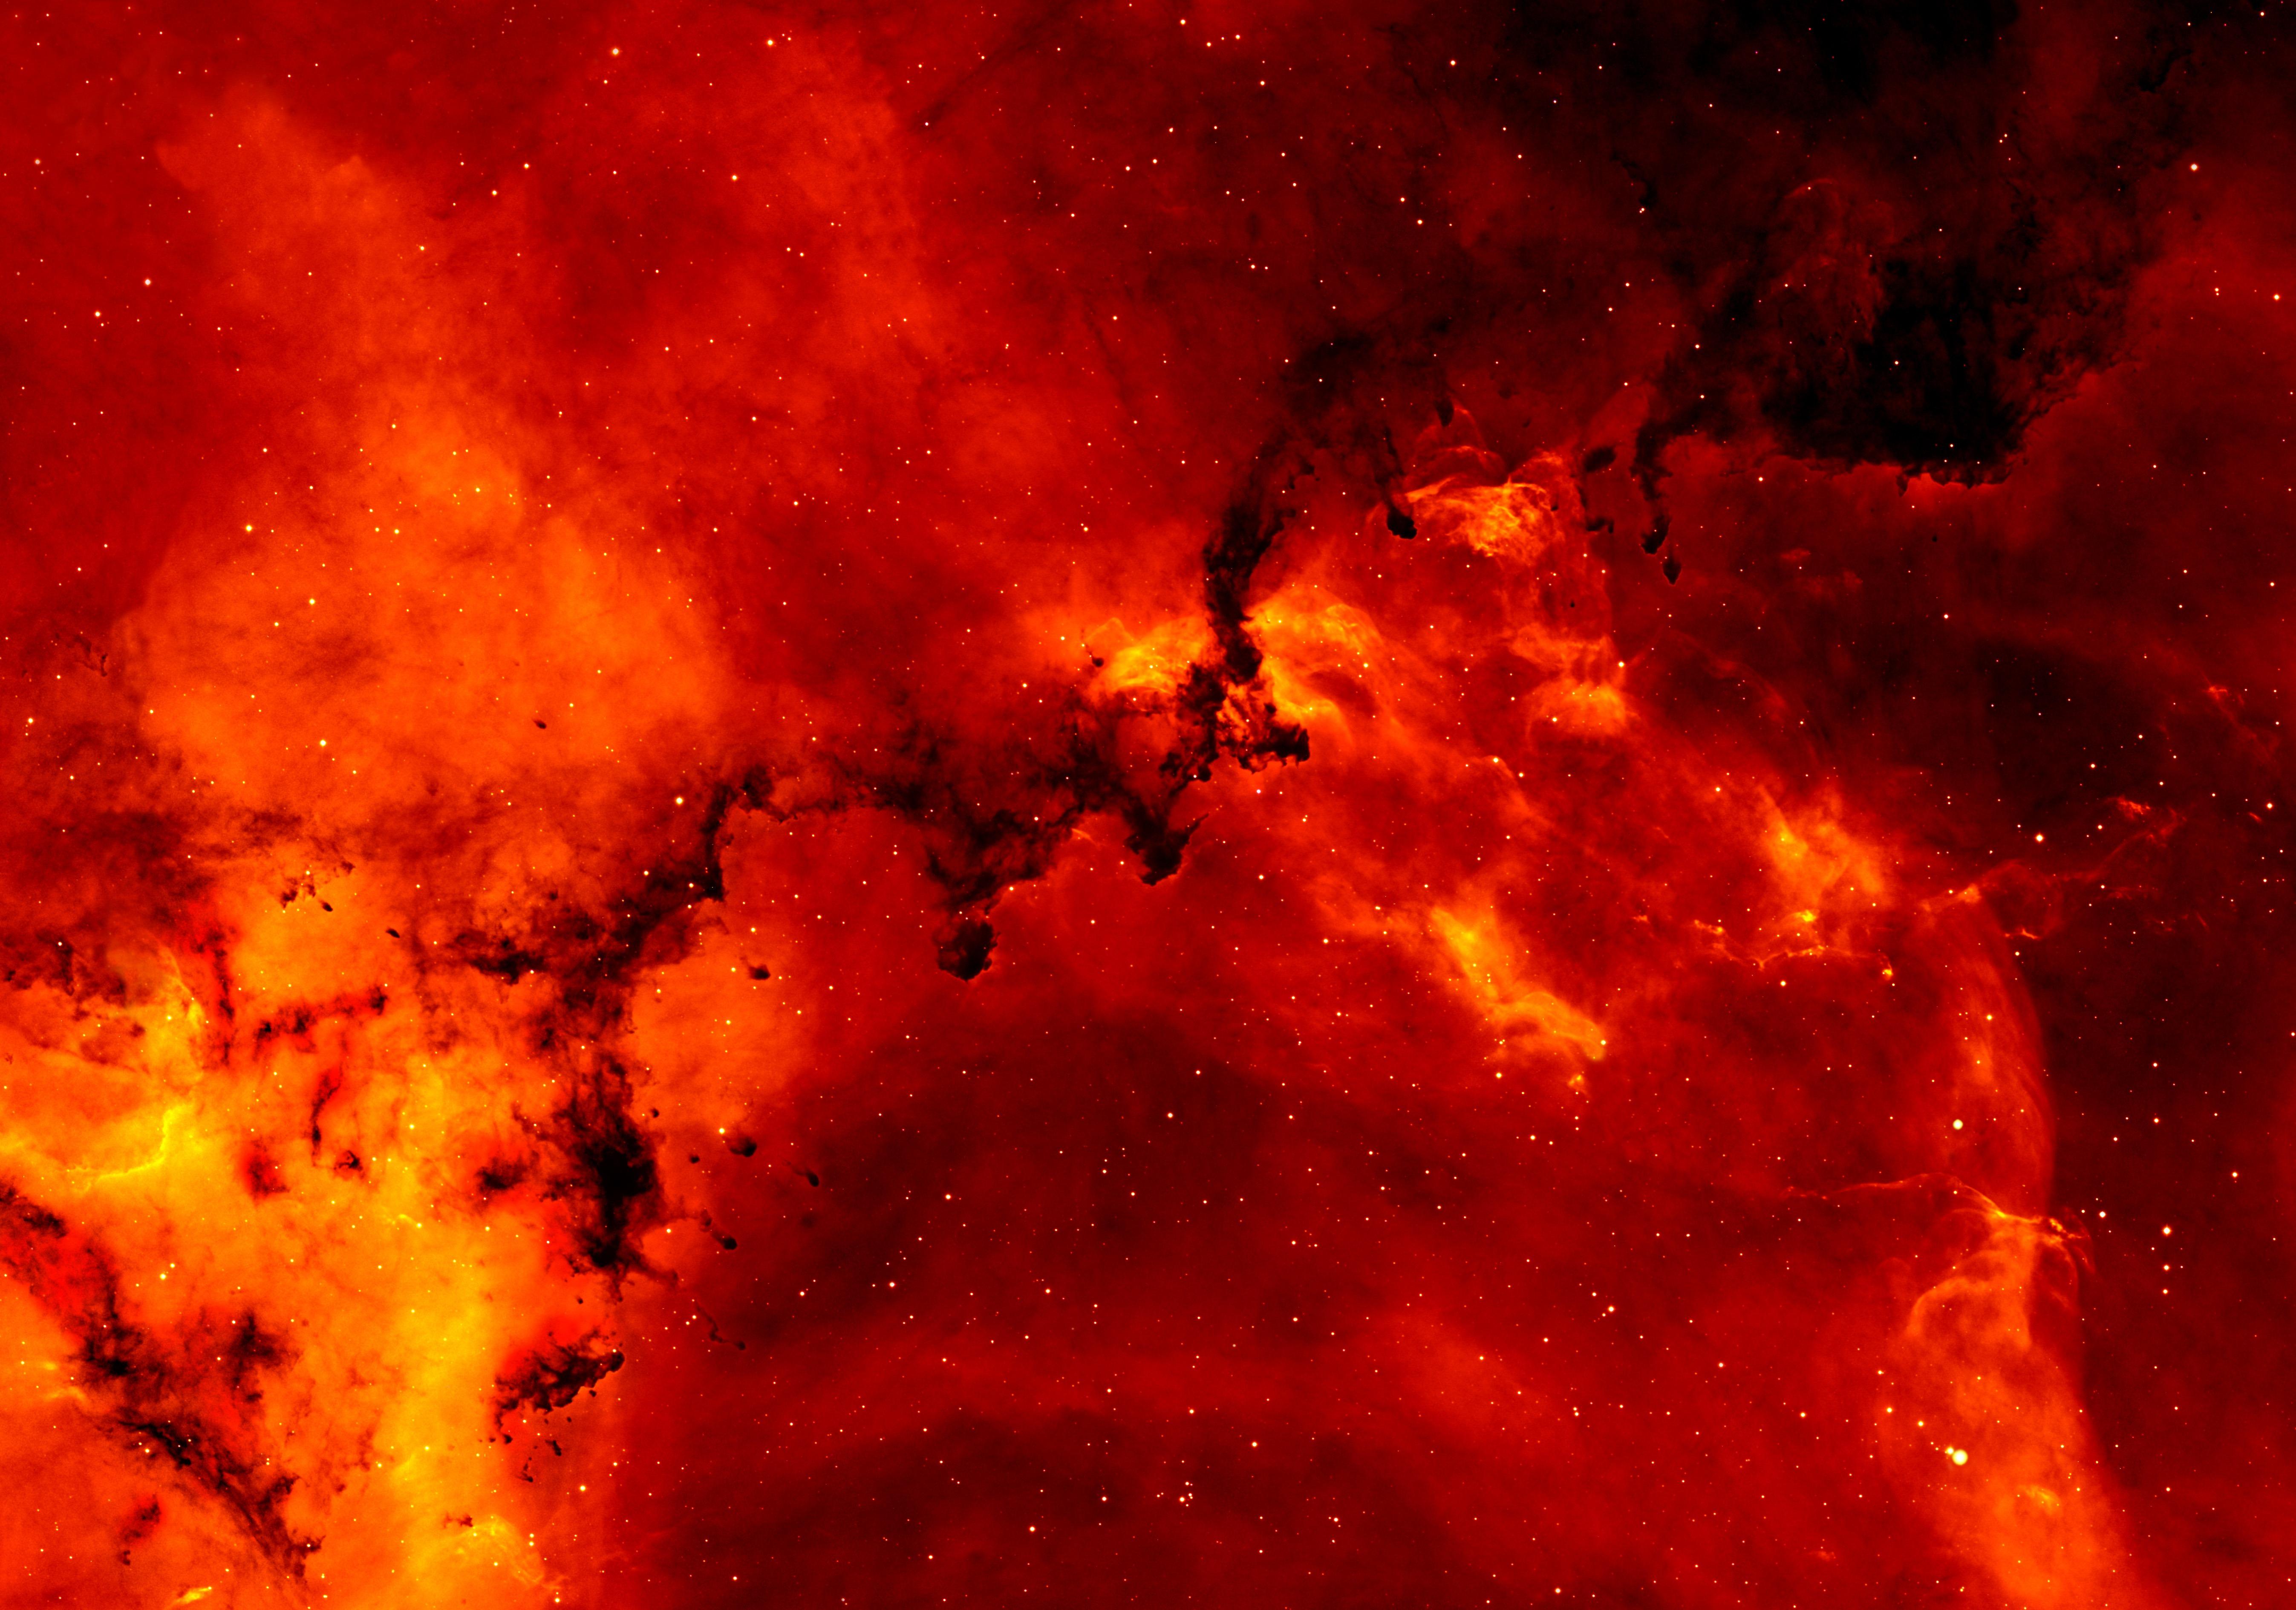 Red and Orange Solar Flare  Free Stock Photo